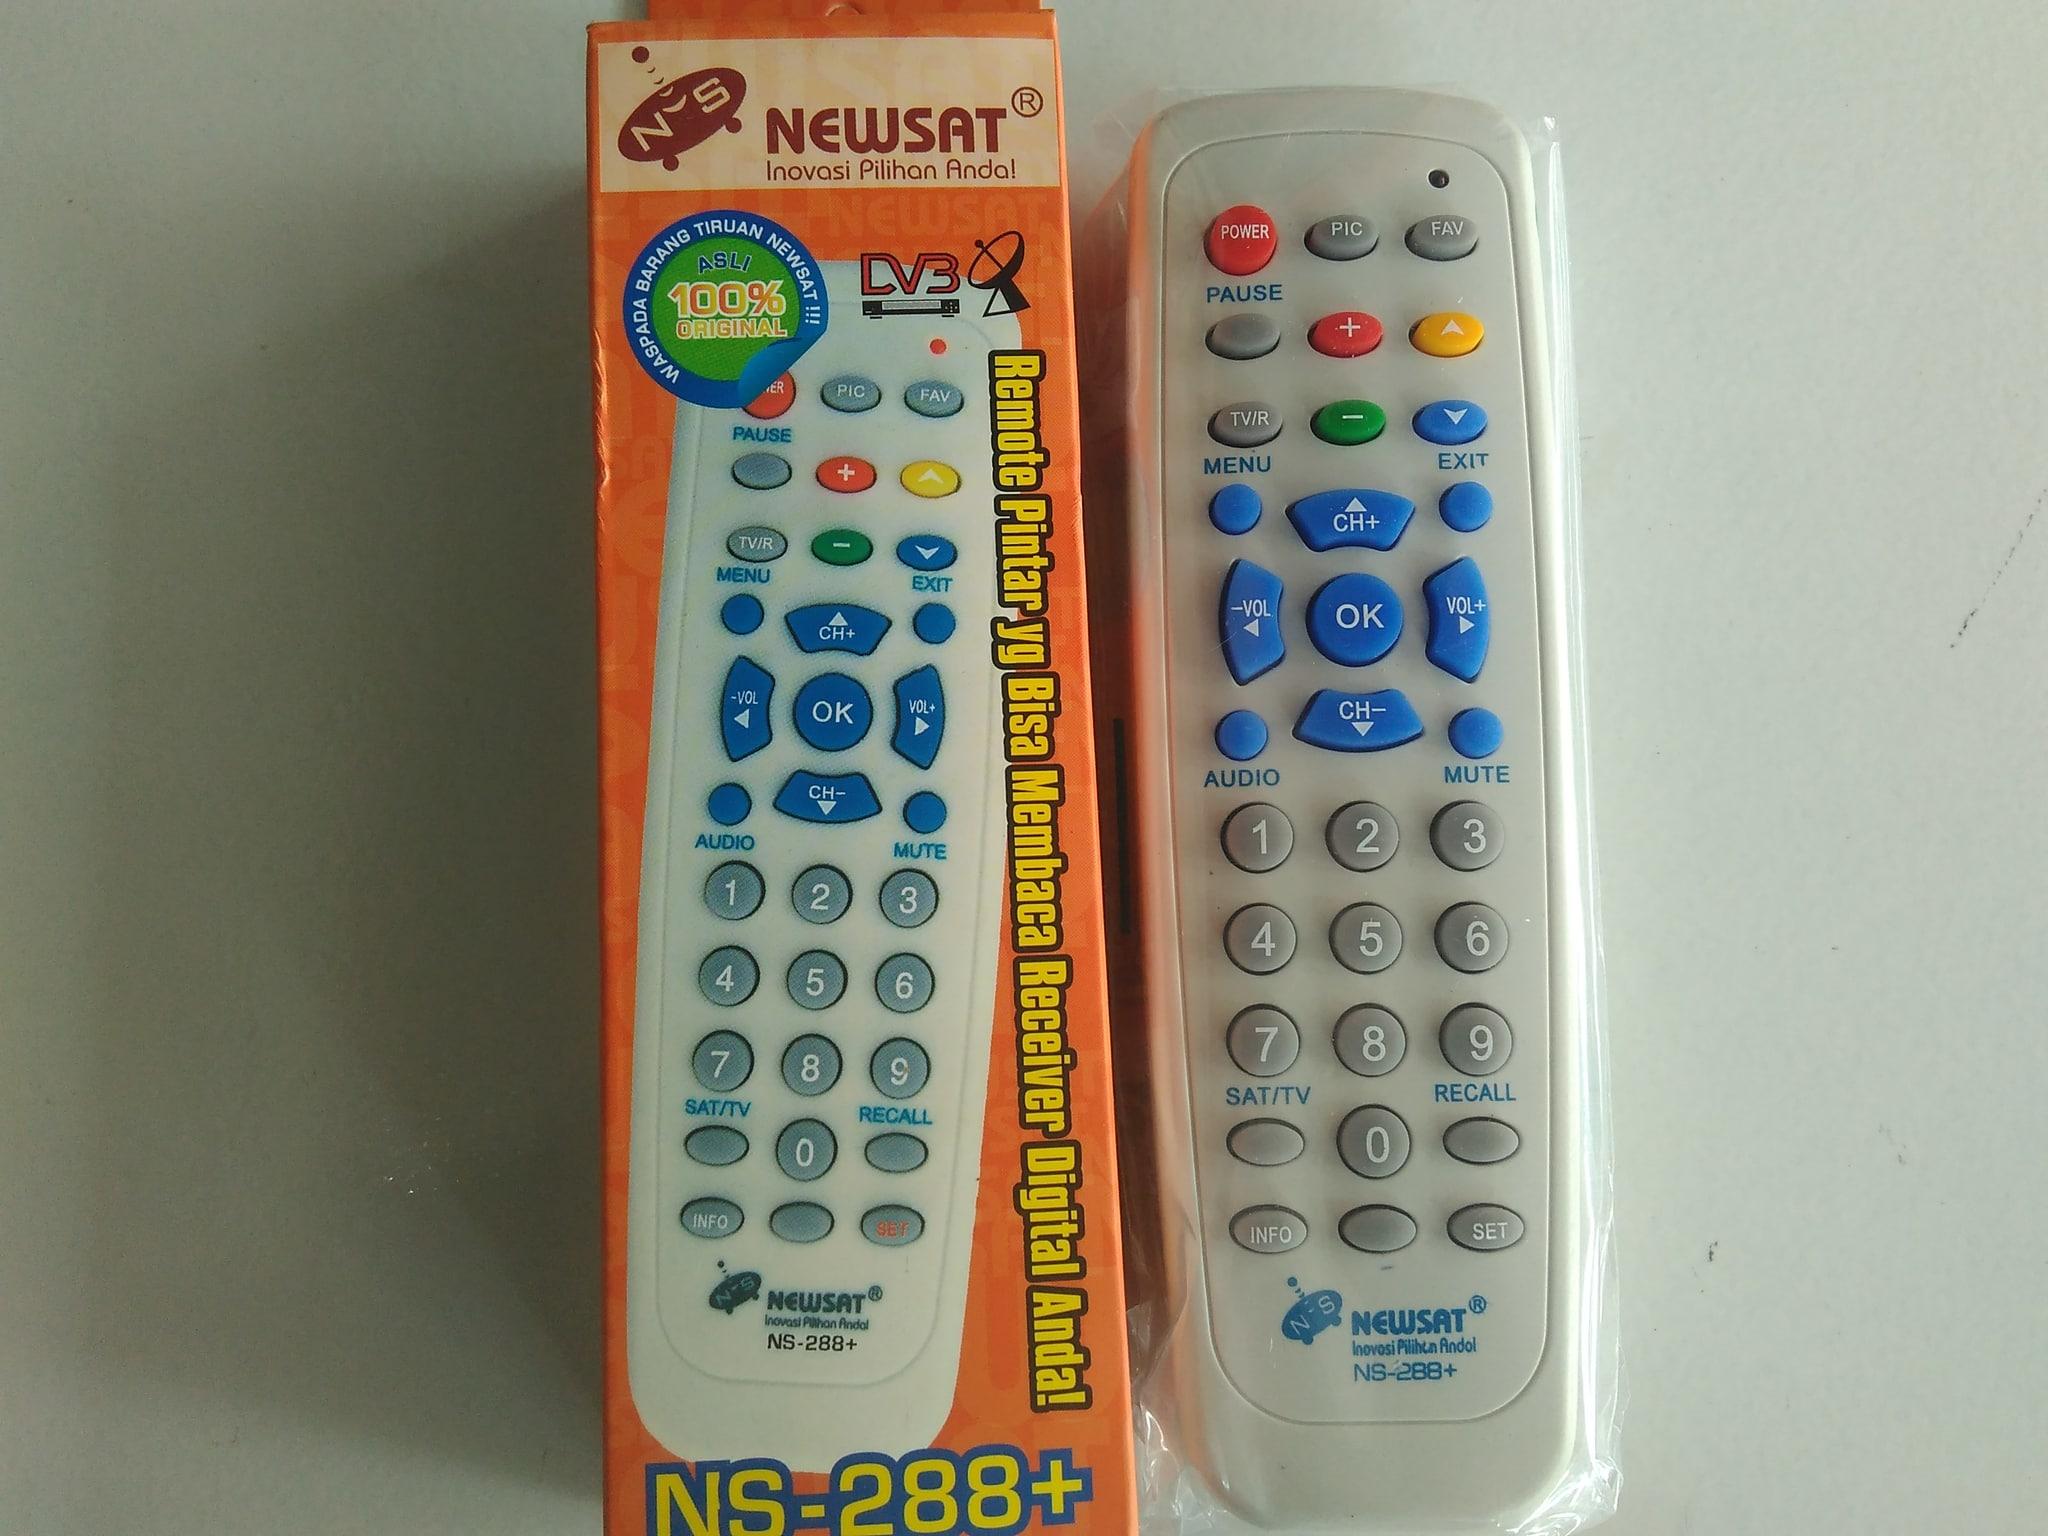 Jual Remot/remote receiver parabola mpeg2 newsat NS-288+